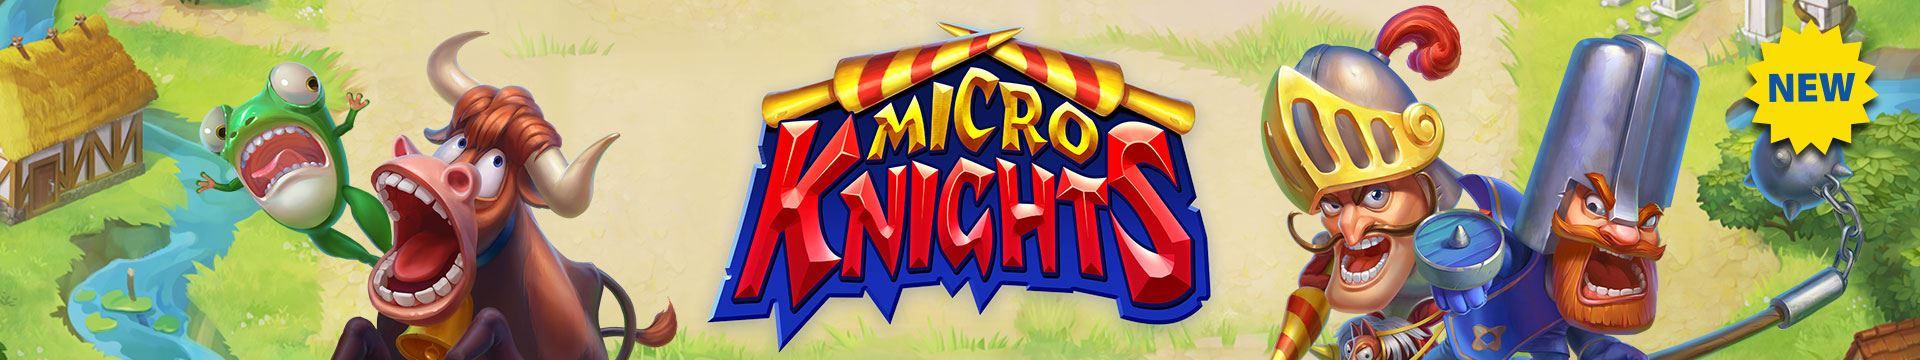 Micro_Knights